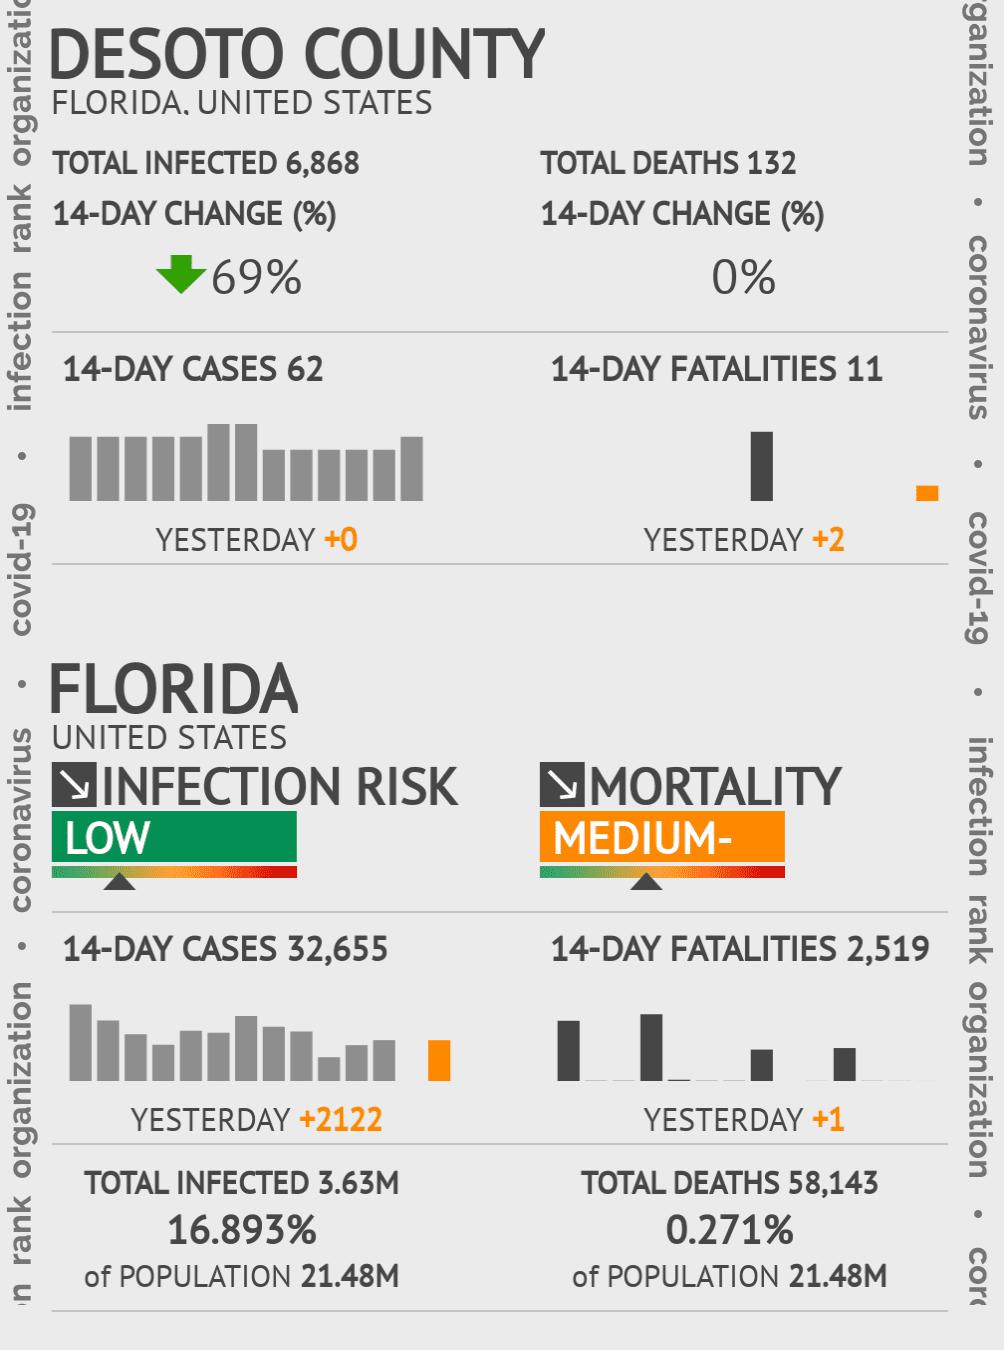 DeSoto County Coronavirus Covid-19 Risk of Infection on October 16, 2020